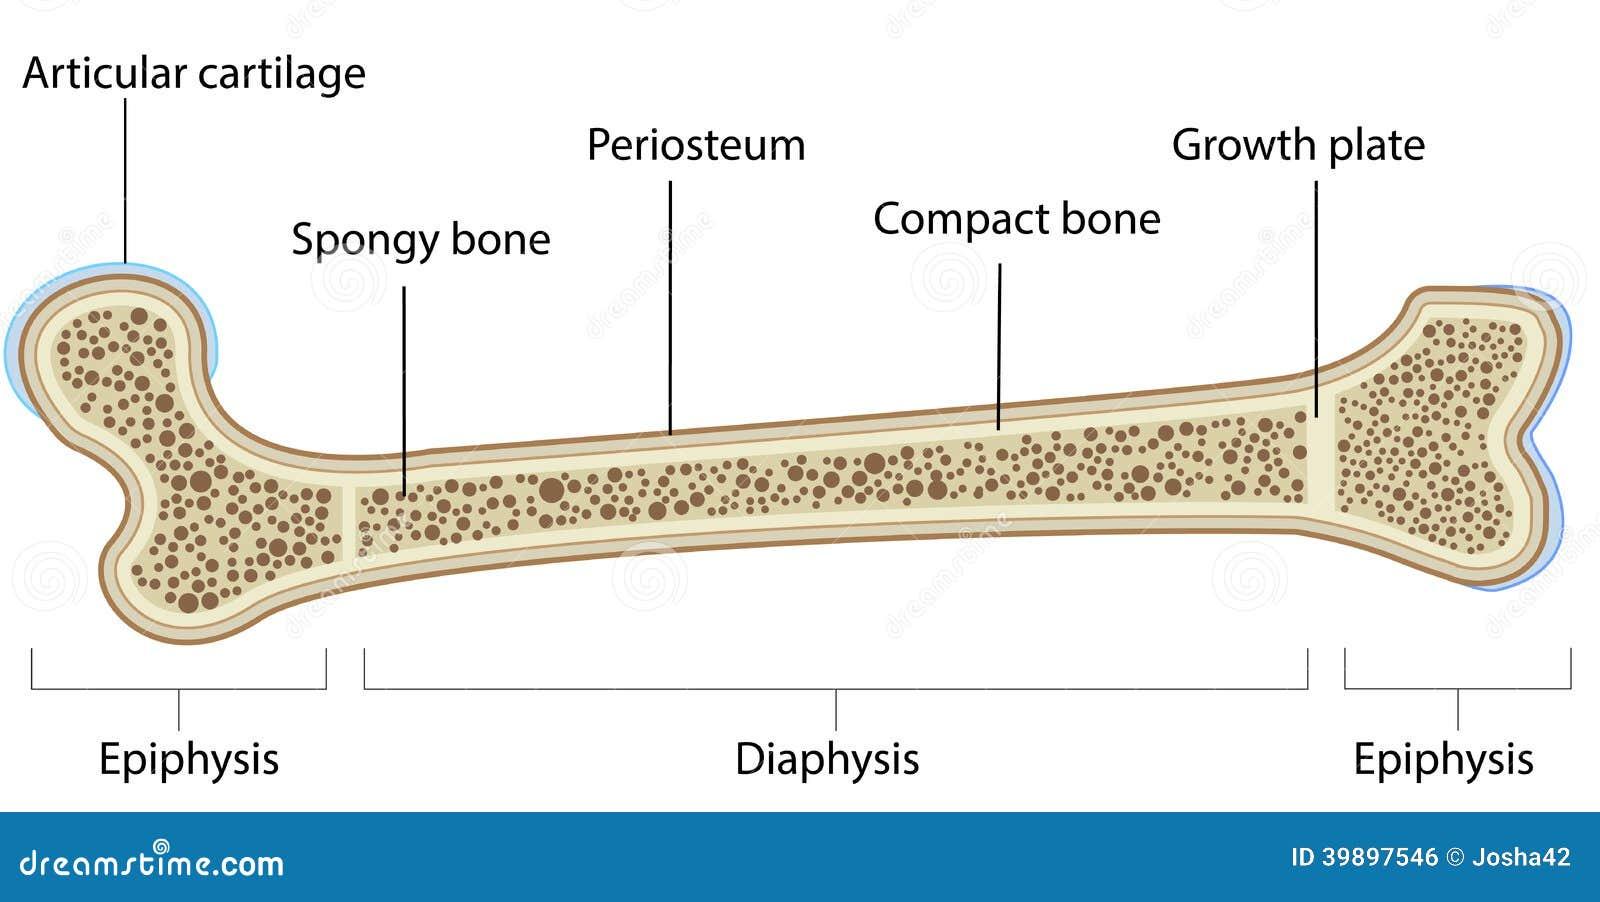 bone anatomy labeled diagram stock vector image 39897546. Black Bedroom Furniture Sets. Home Design Ideas